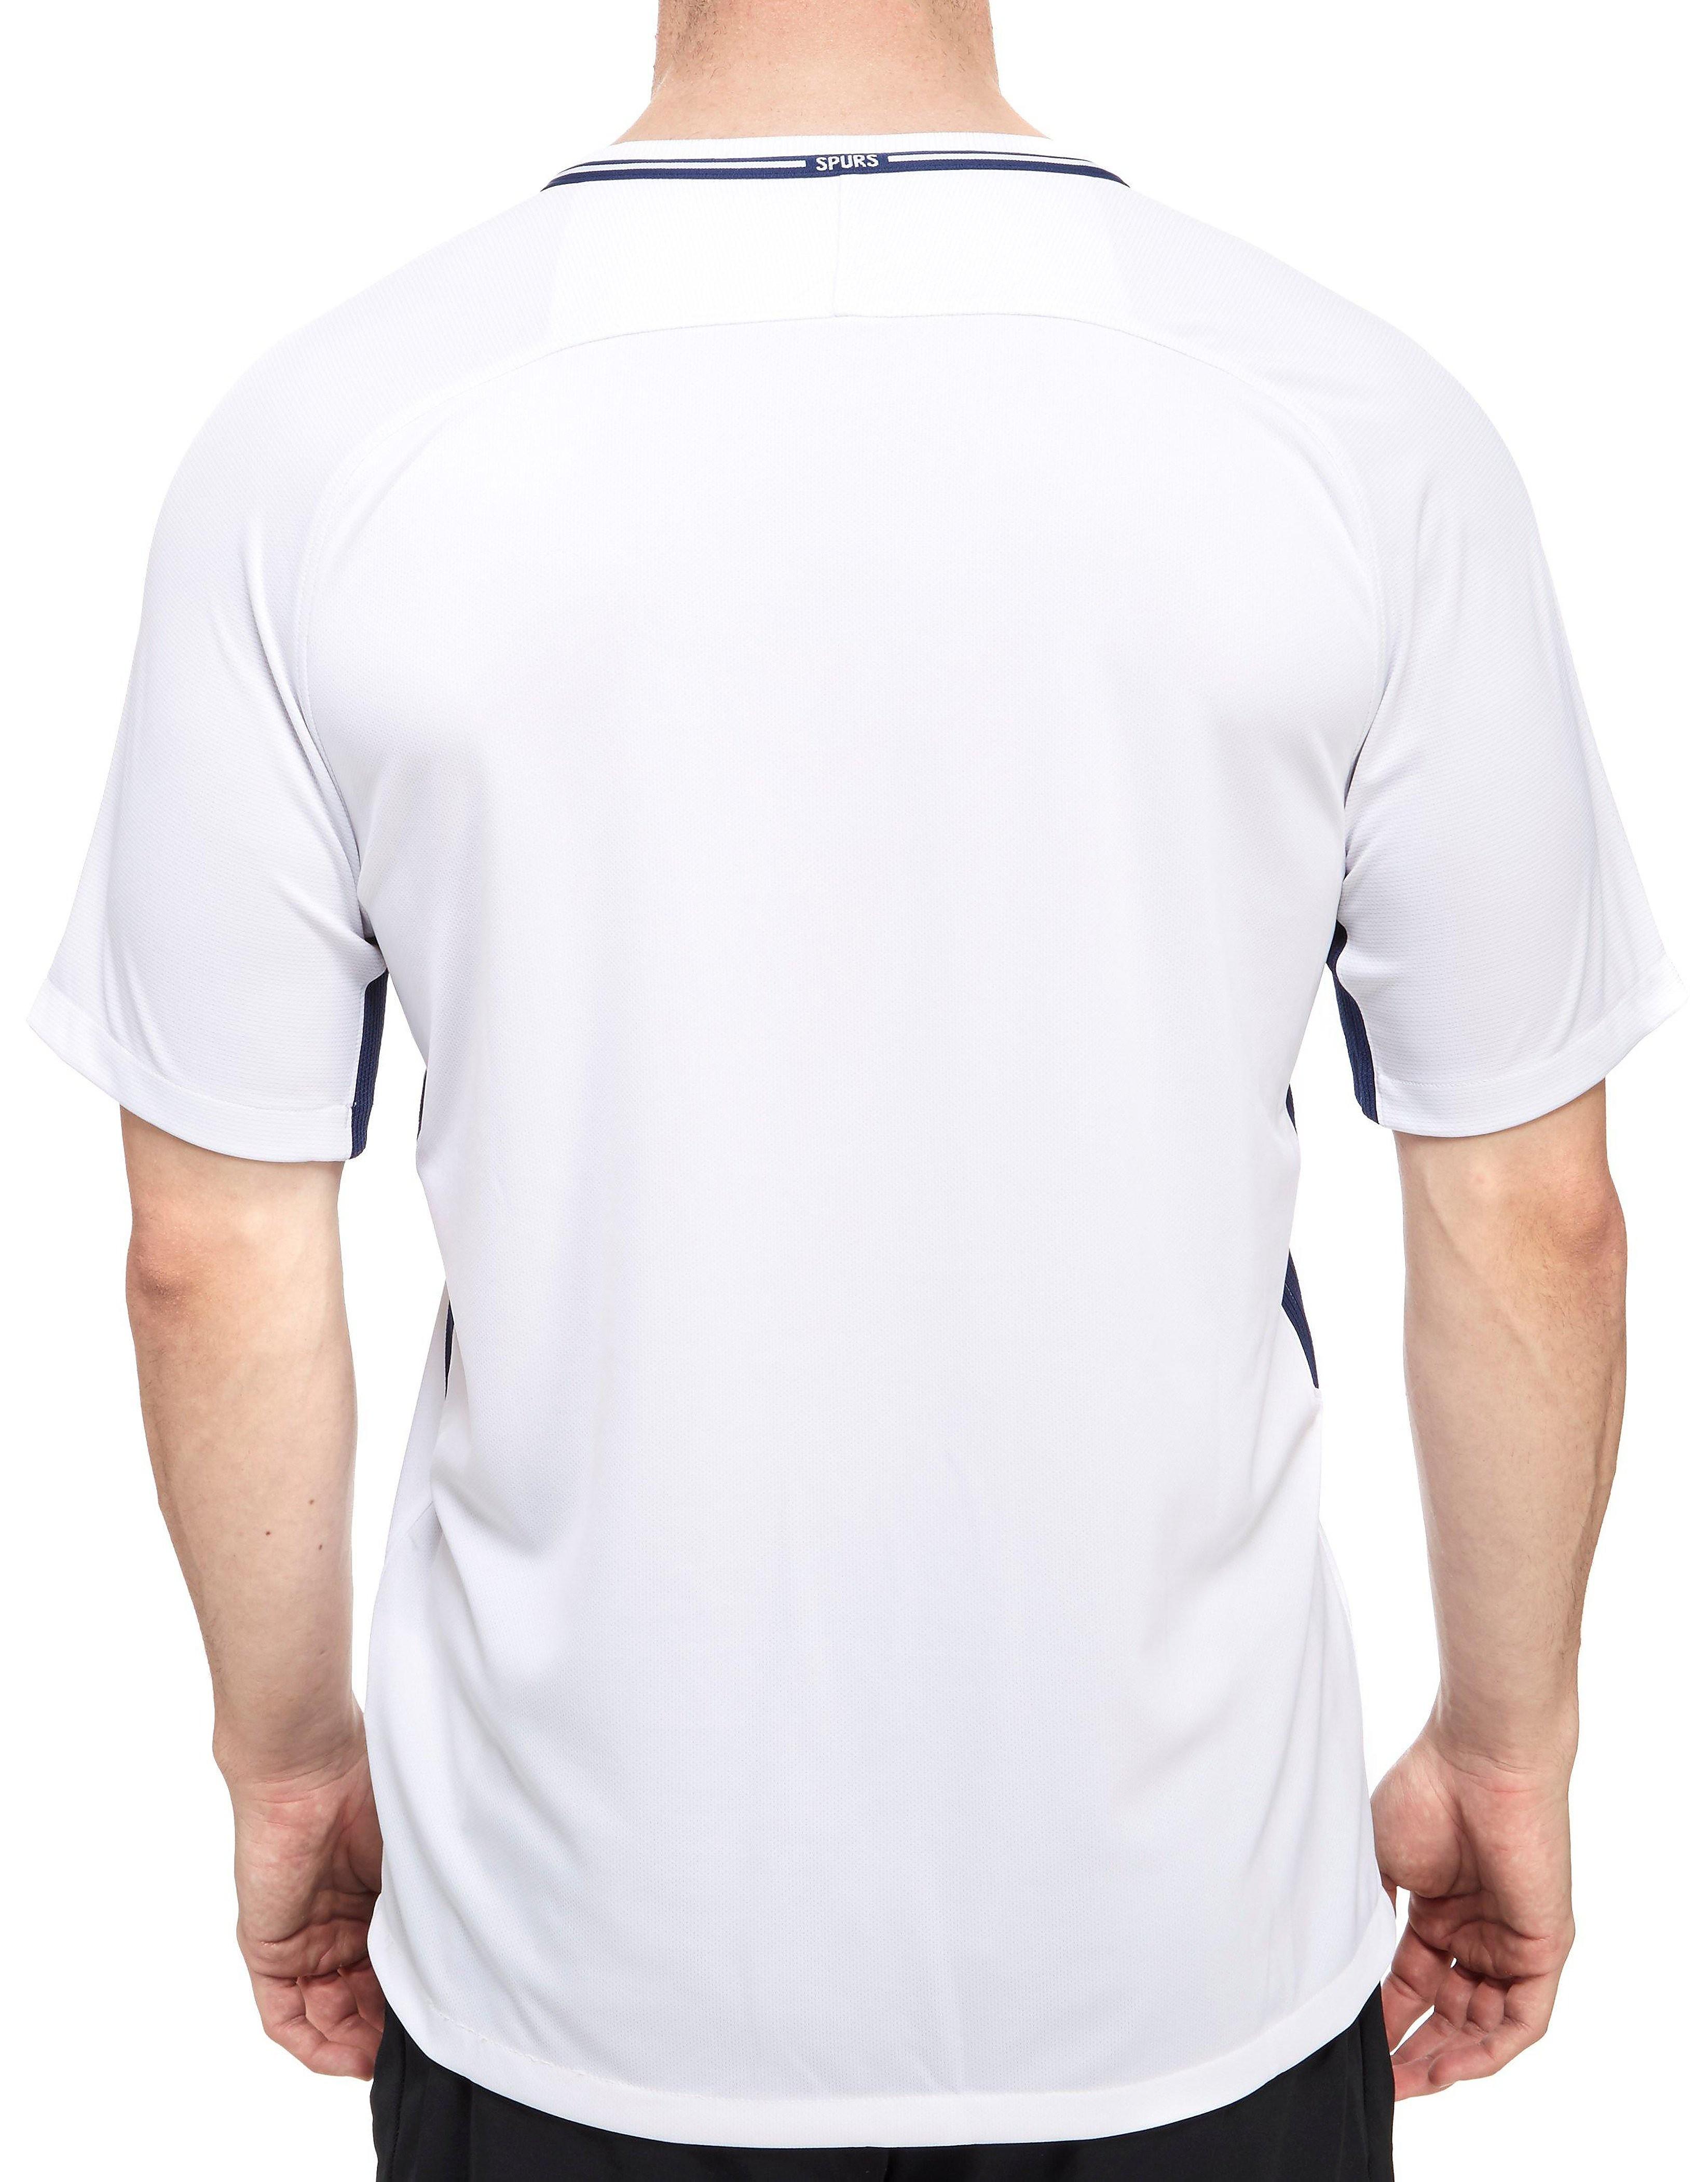 Nike Tottenham Hotspur 2017/18 Home Shirt